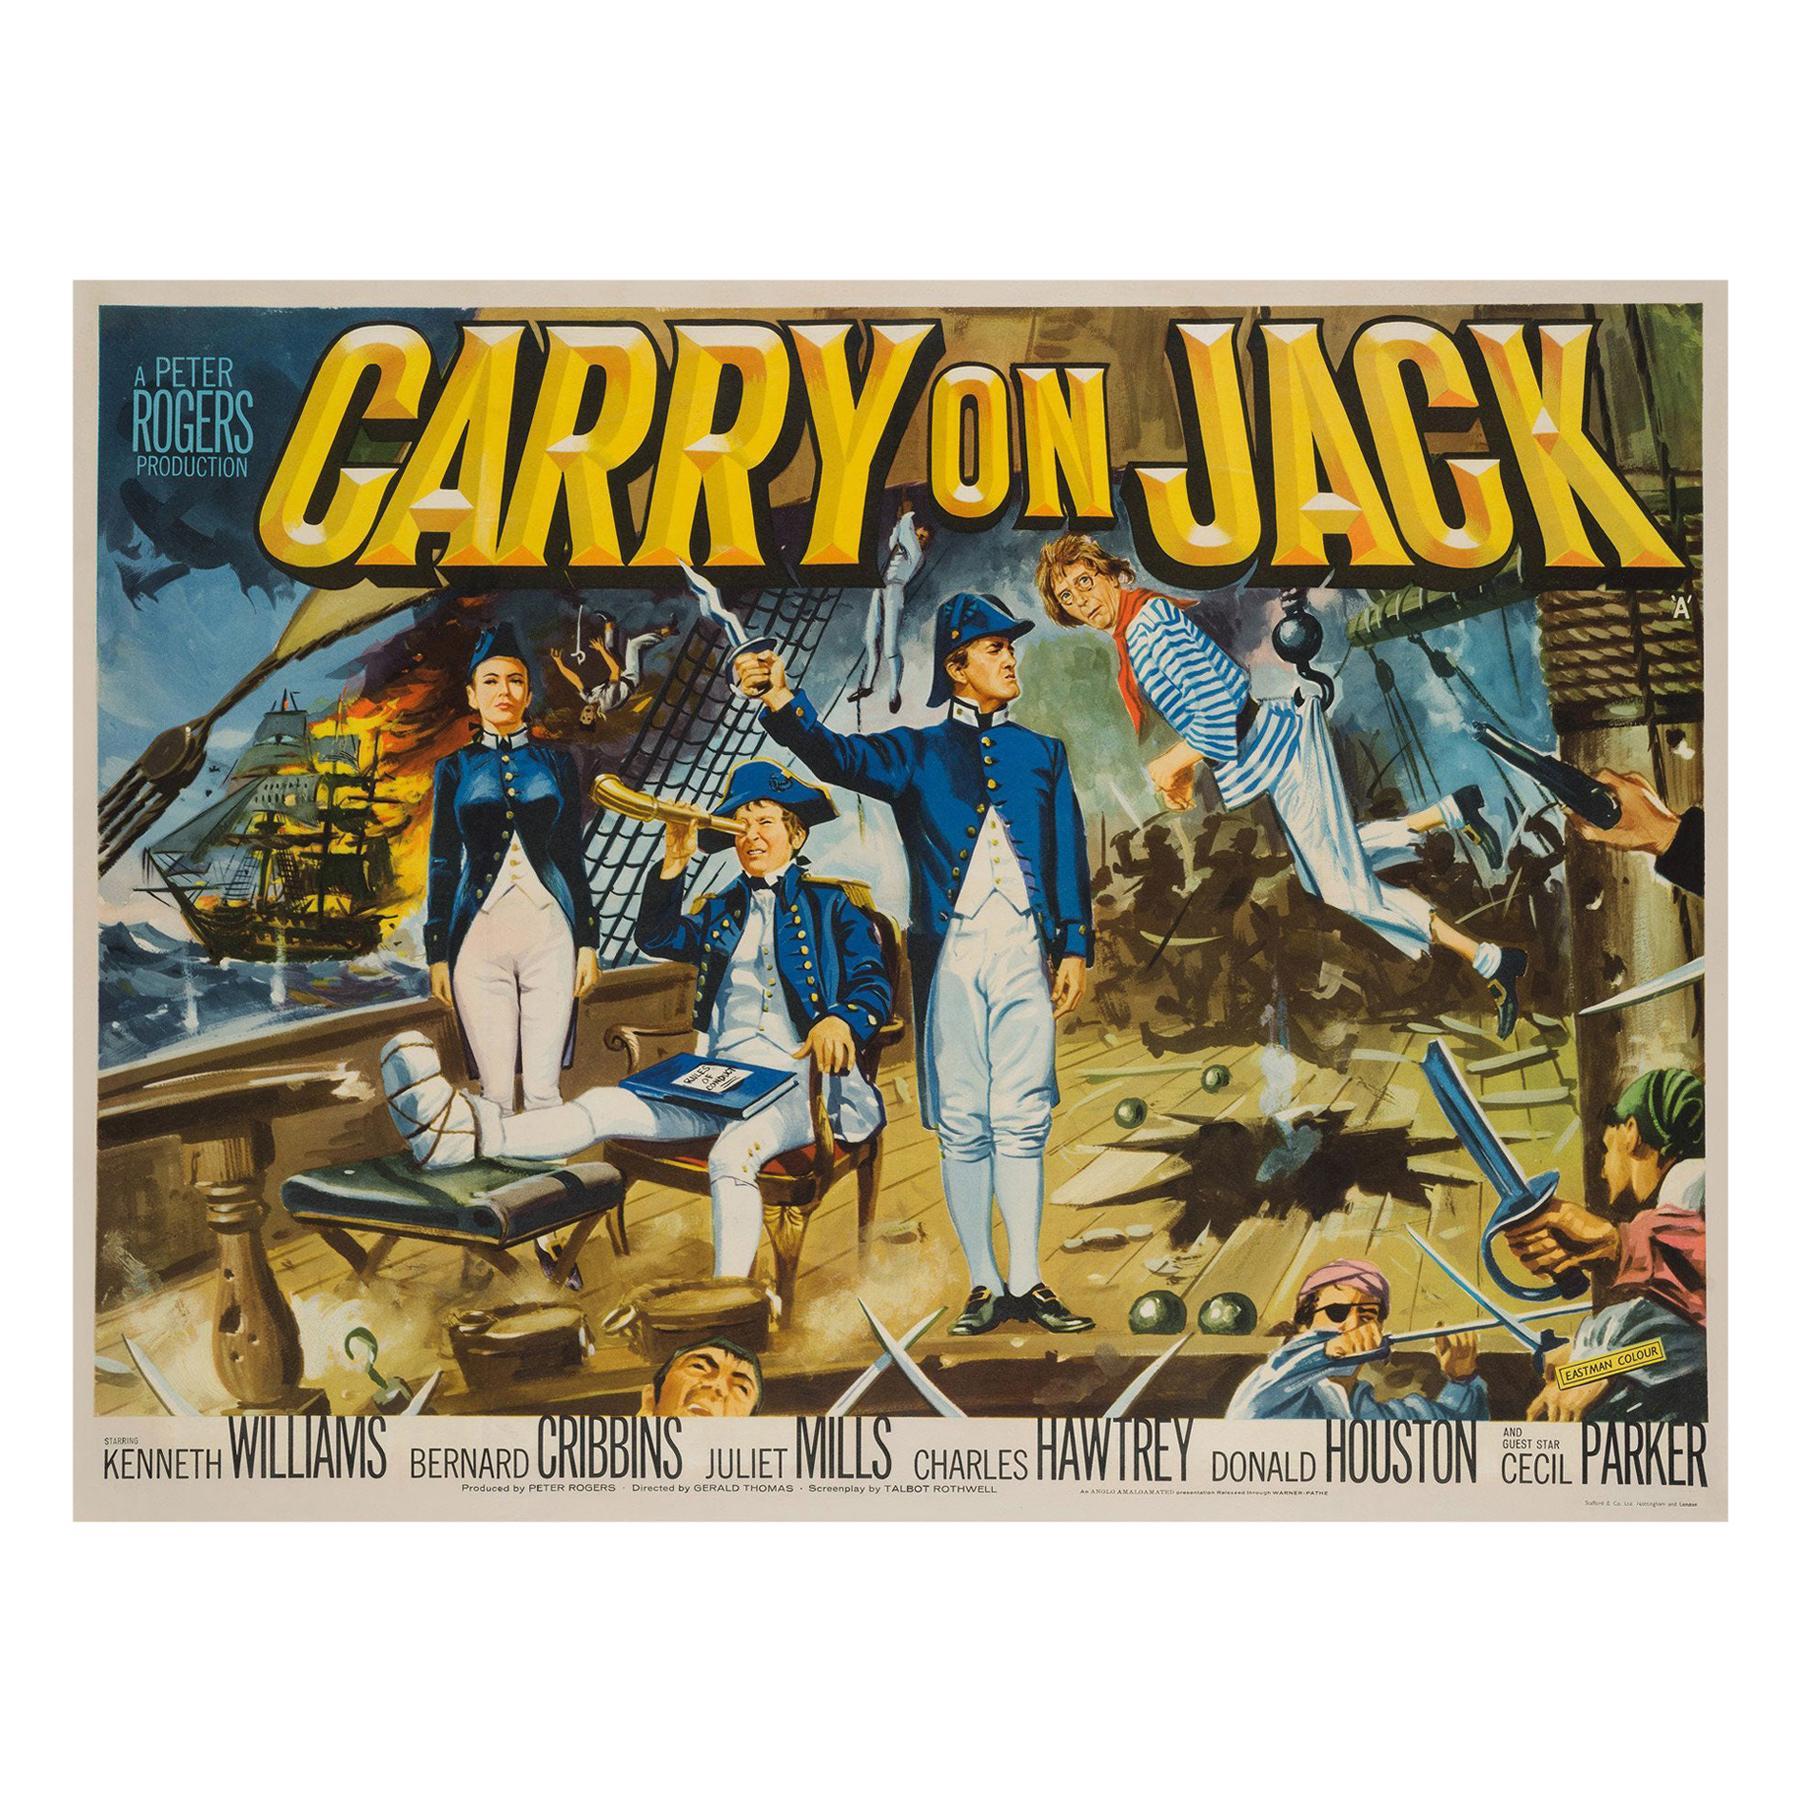 Carry on Jack Original British Film Poster, Chantrell, 1963